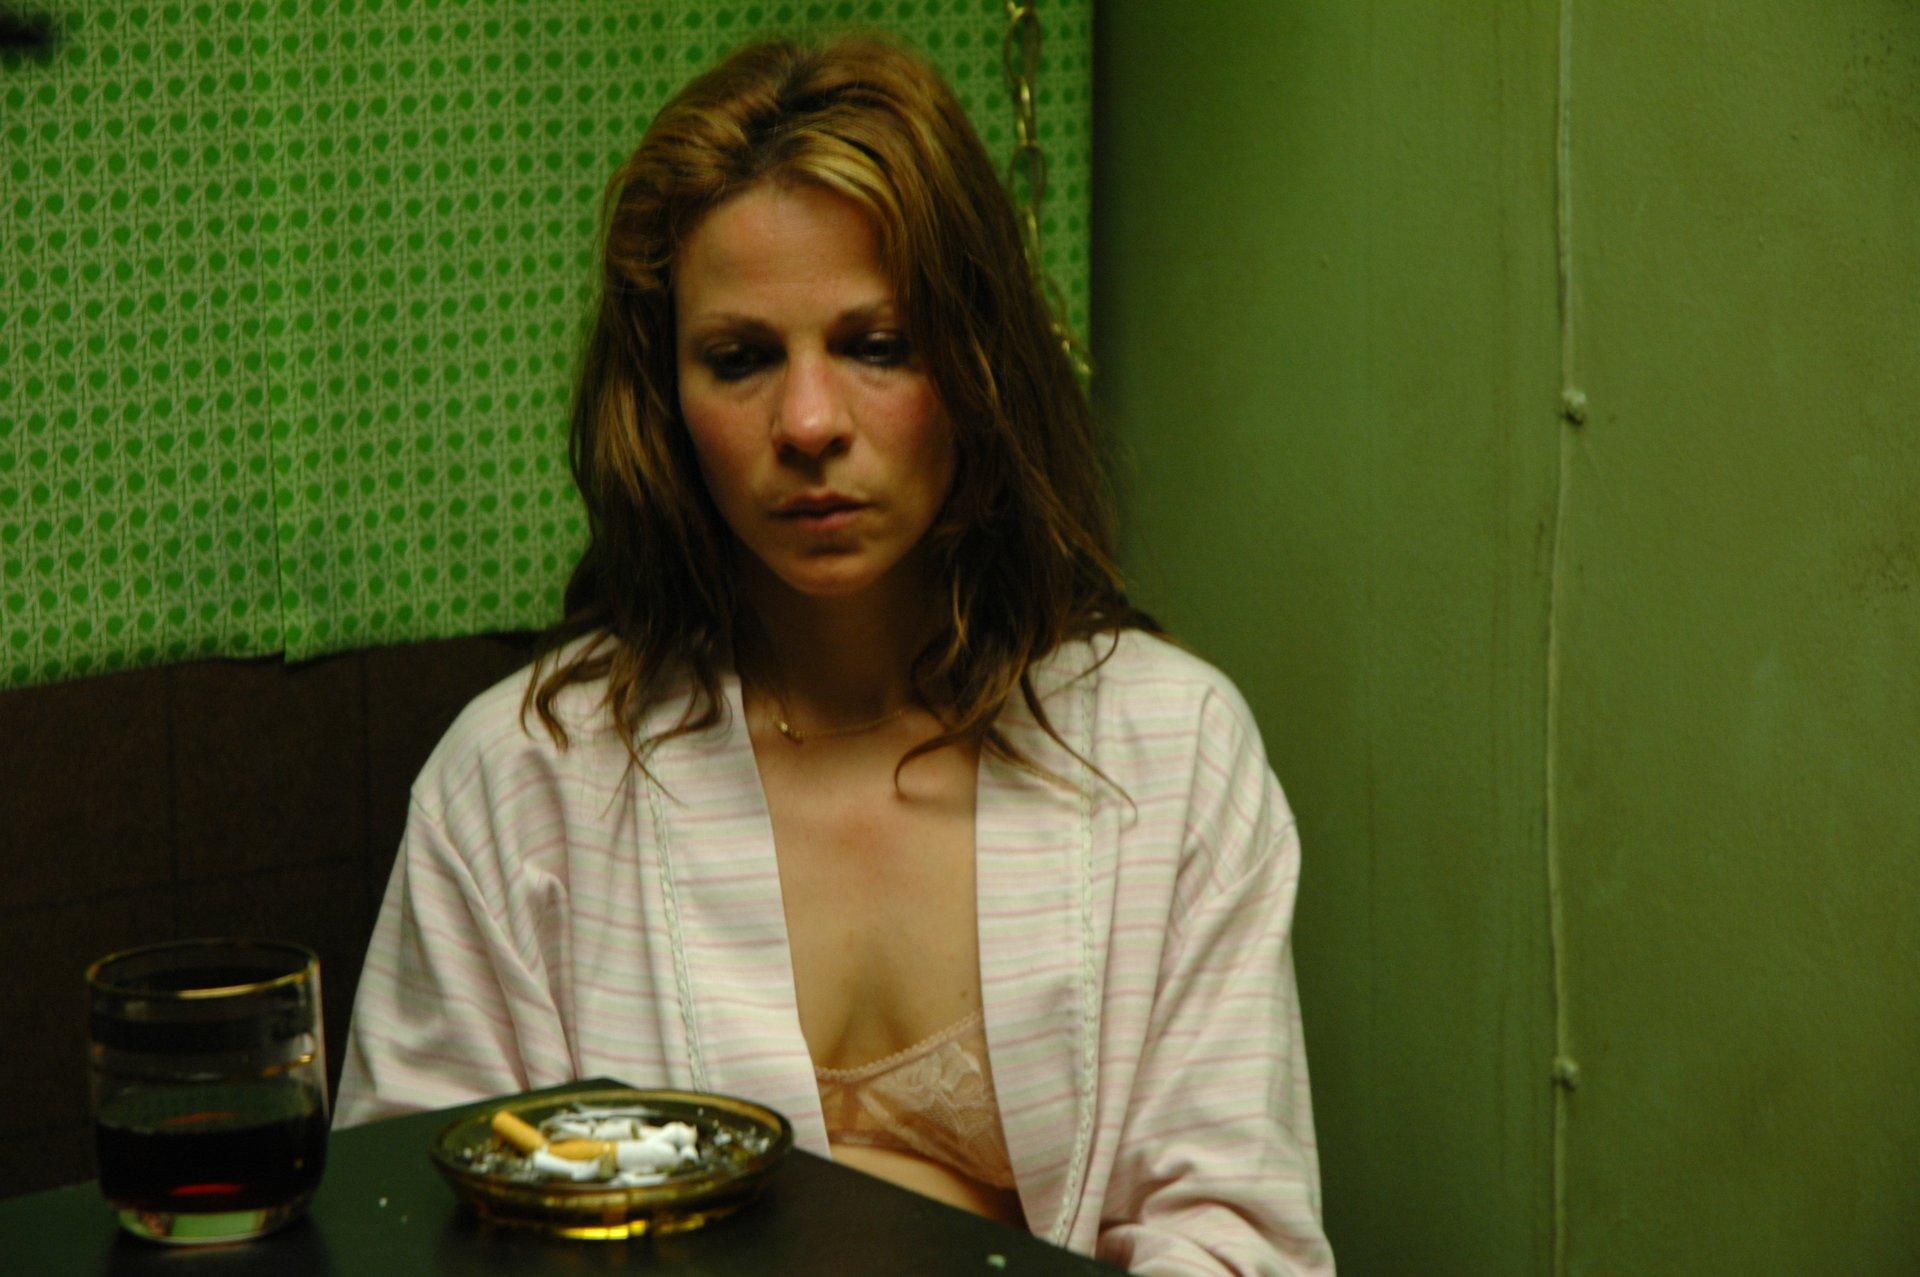 Director: Bent Hamer  Cast: Matt Dillon, Lili Taylor, Marisa Tomei